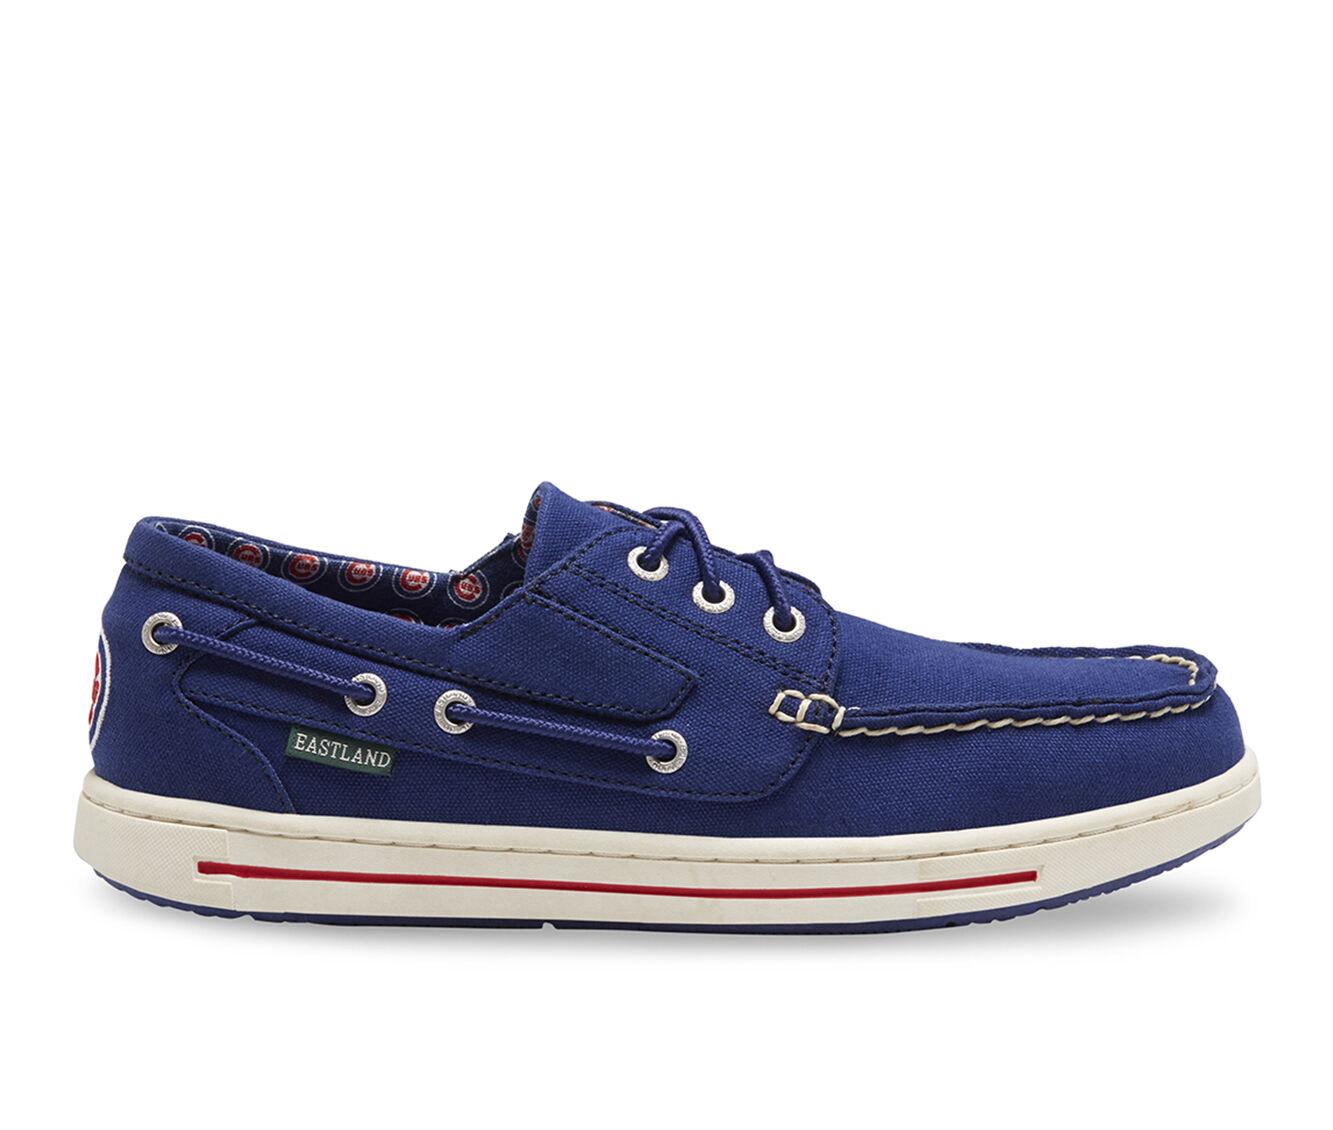 Men's Eastland Adventure MLB Cubs Boat Shoes Blue